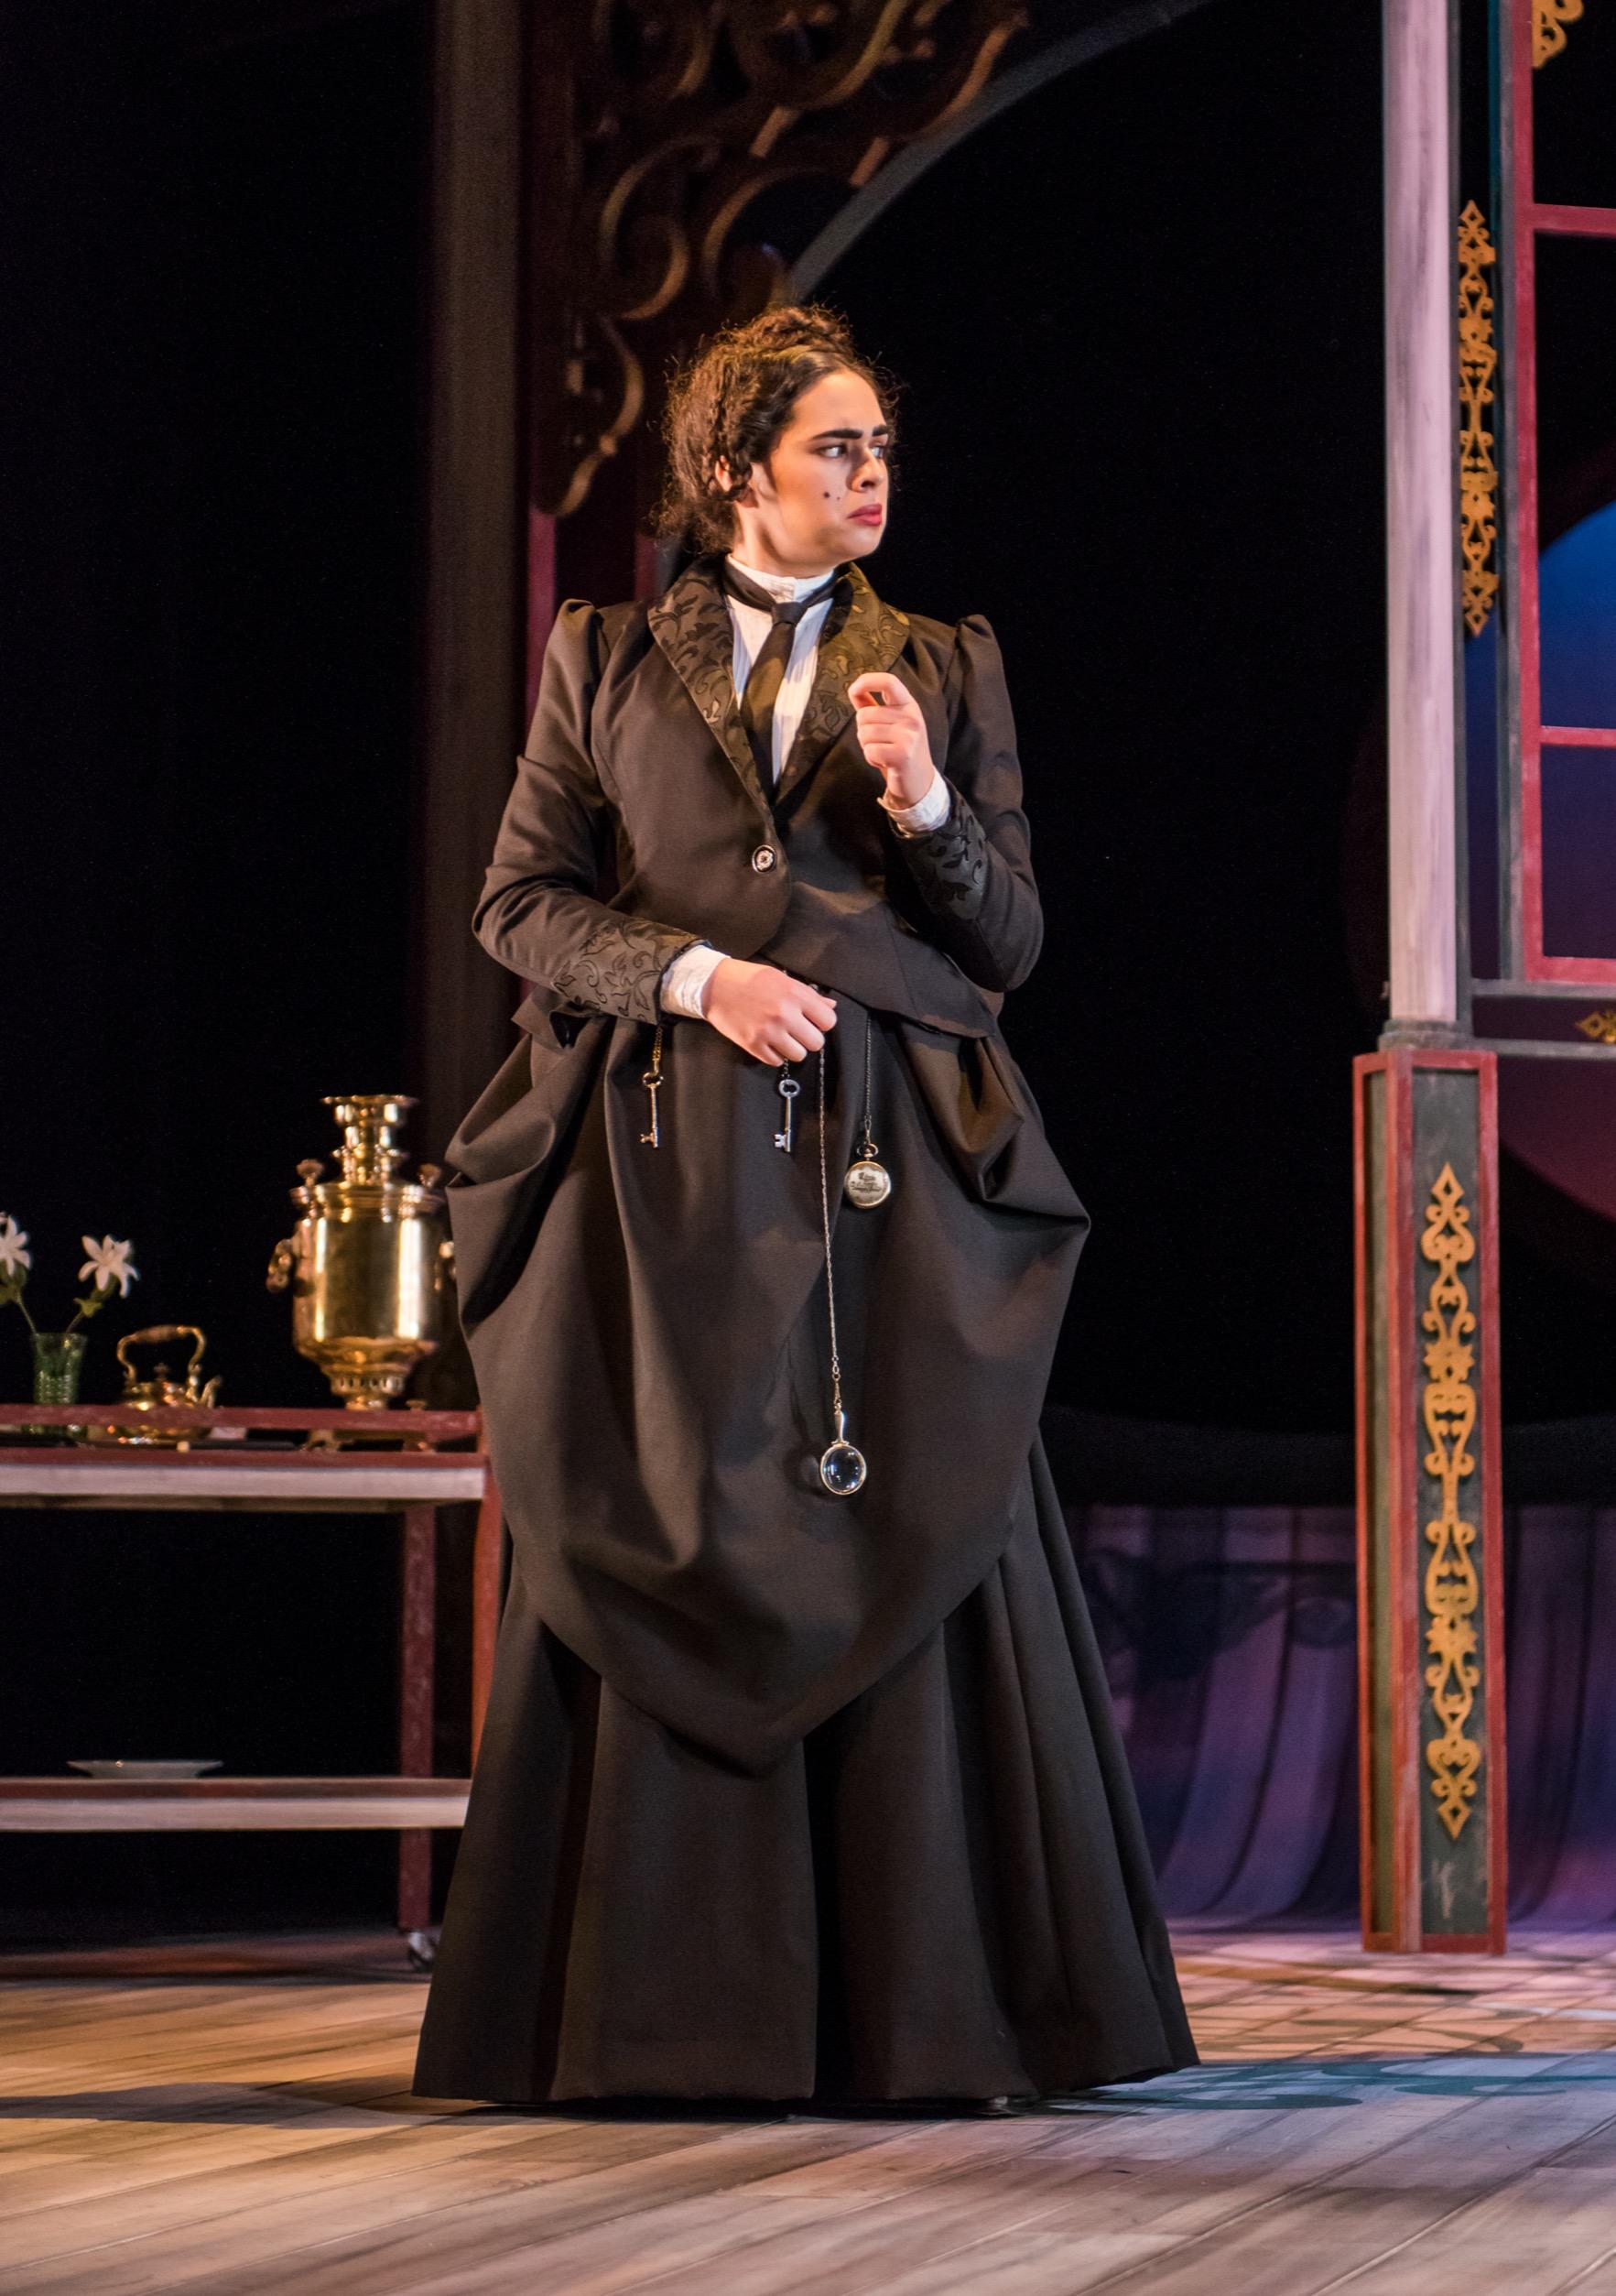 Malvolia from Twelfth Night